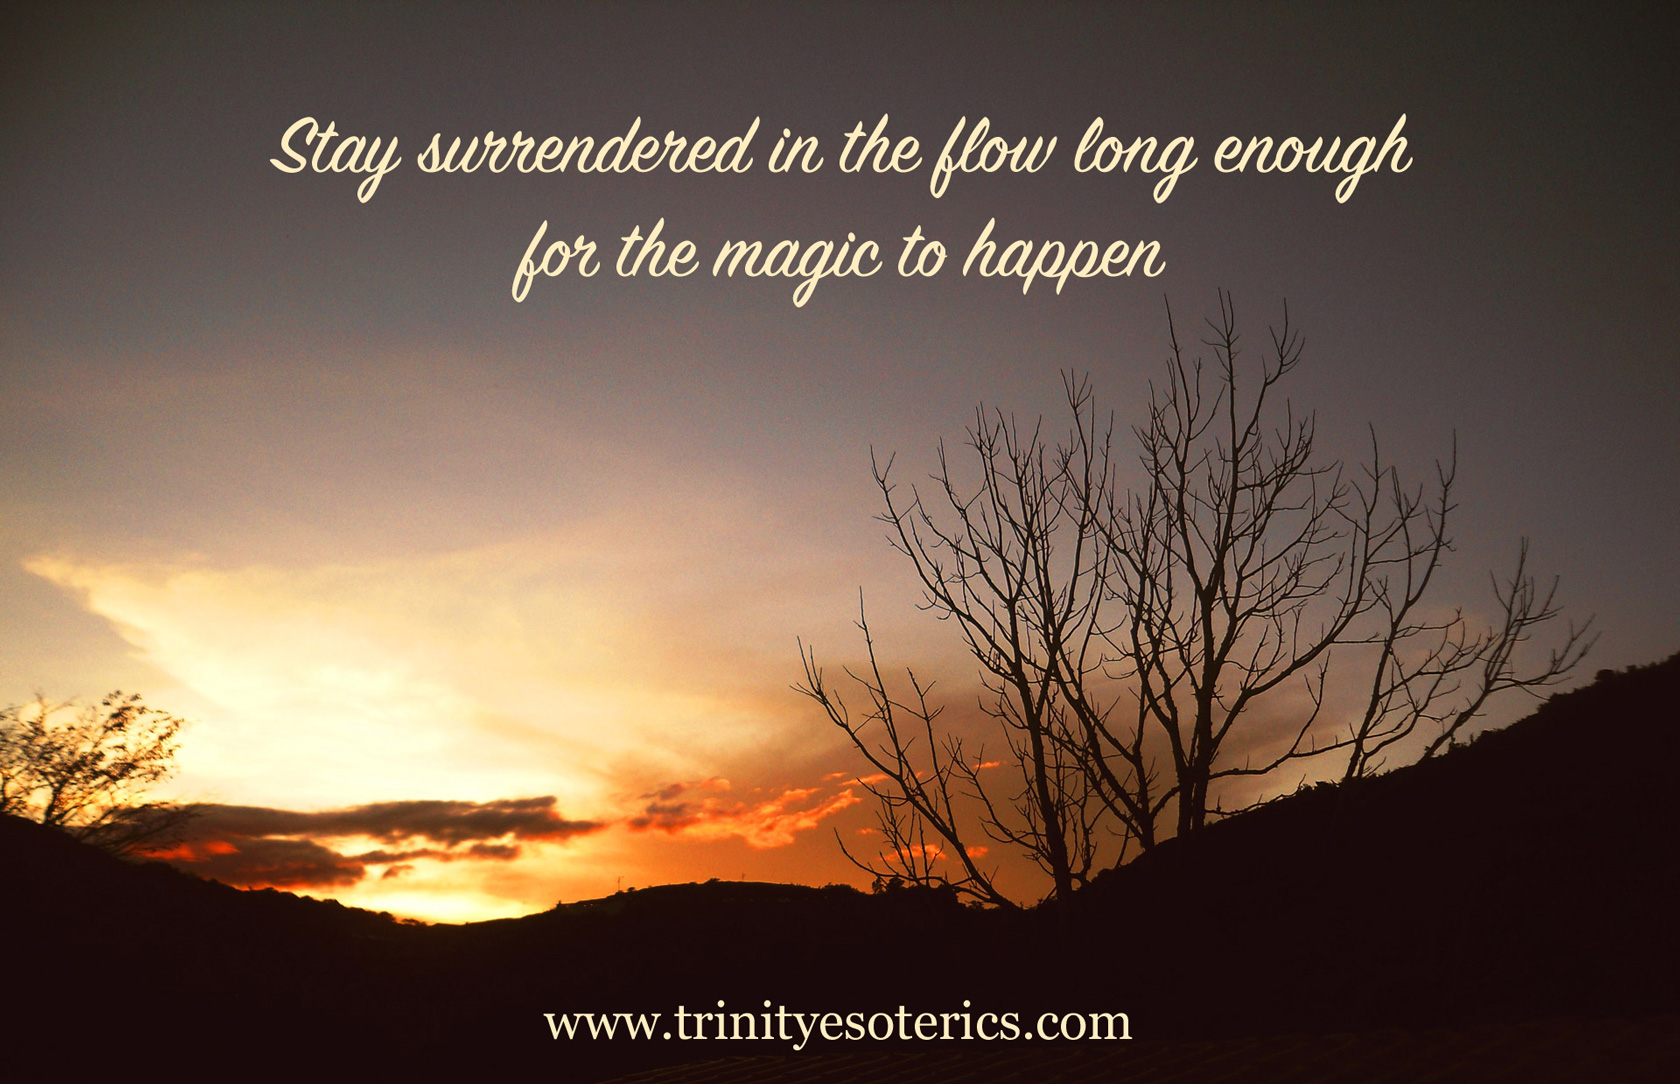 dawn trinity esoterics